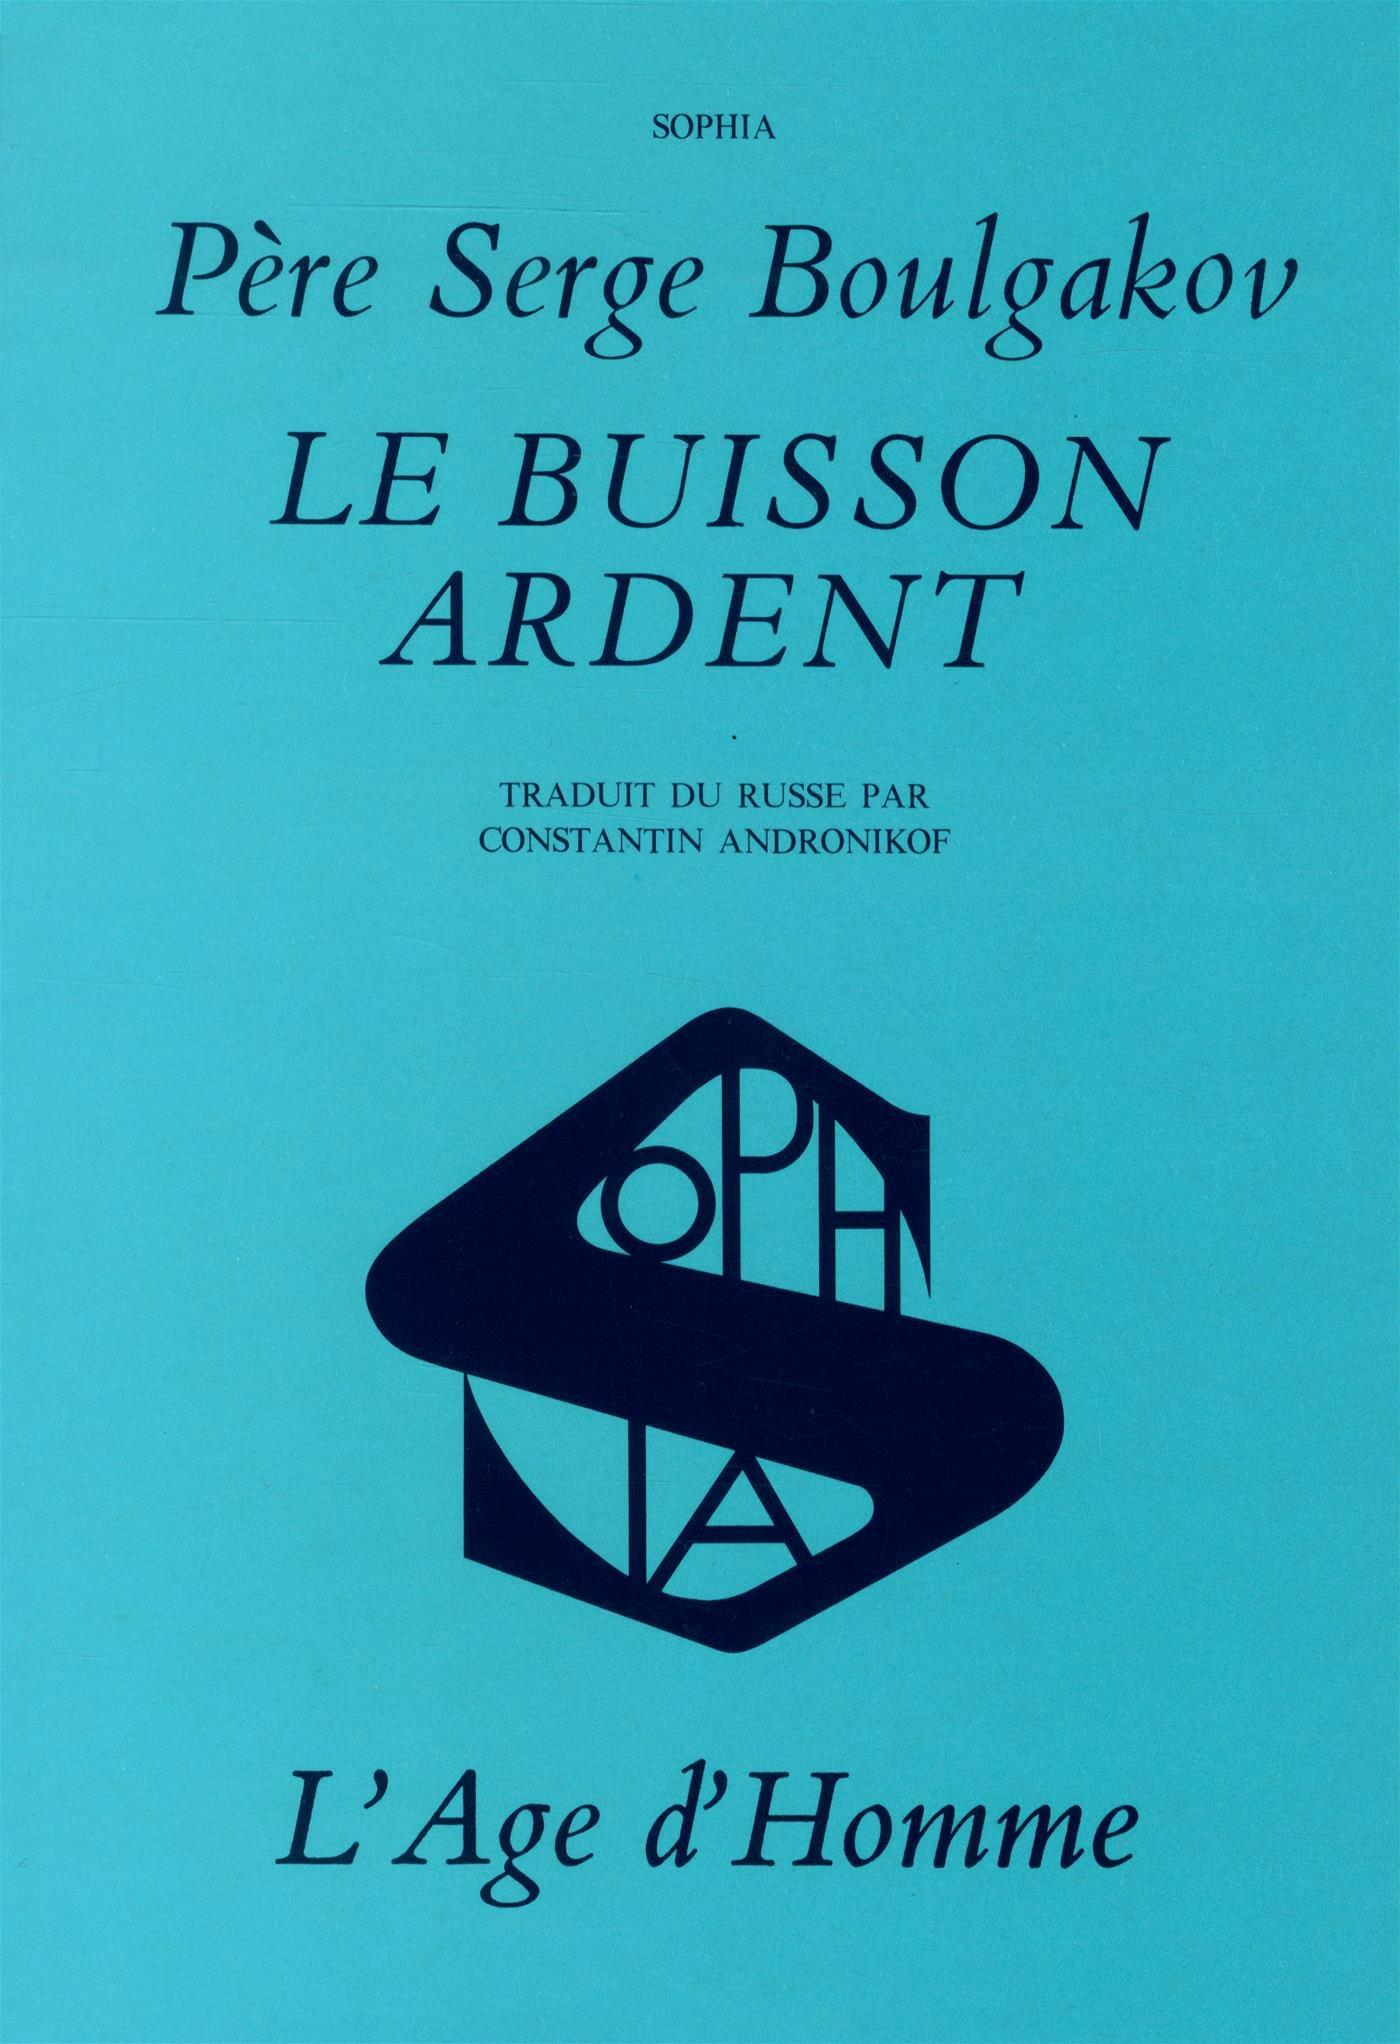 Buisson ardent (le): Amazon.es: Pere Boulgakov Serge: Libros en ...